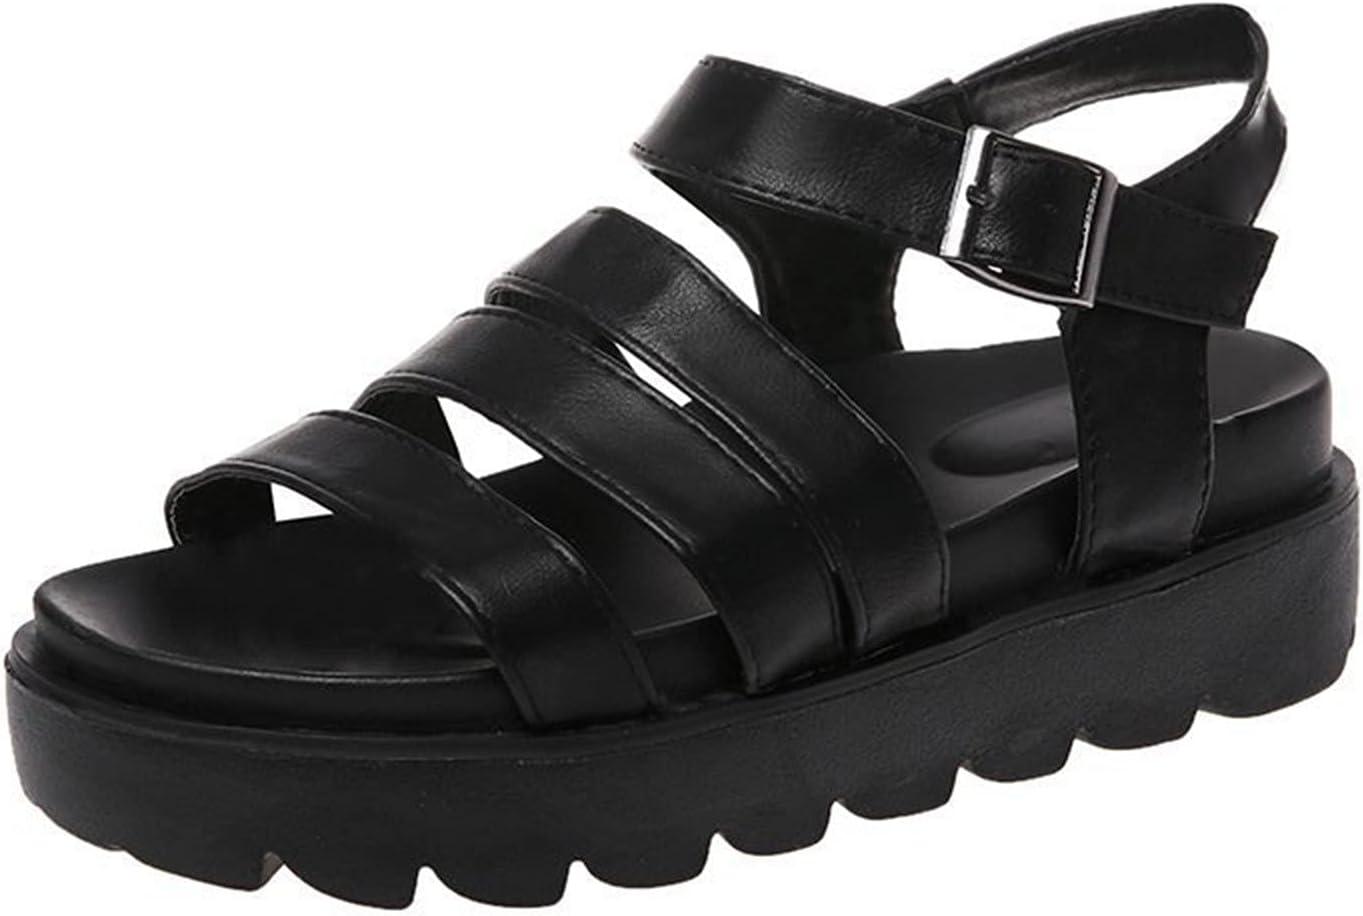 Flip Flop Sandals for Women Fluffy Slippers for Men Flip Flops Mens 12 Small Wedge Pillow for Sleeping Shoes Rack Espadrilles for Men Leather Beach Shoes for Girls Size 10 (Black ,7.5 )